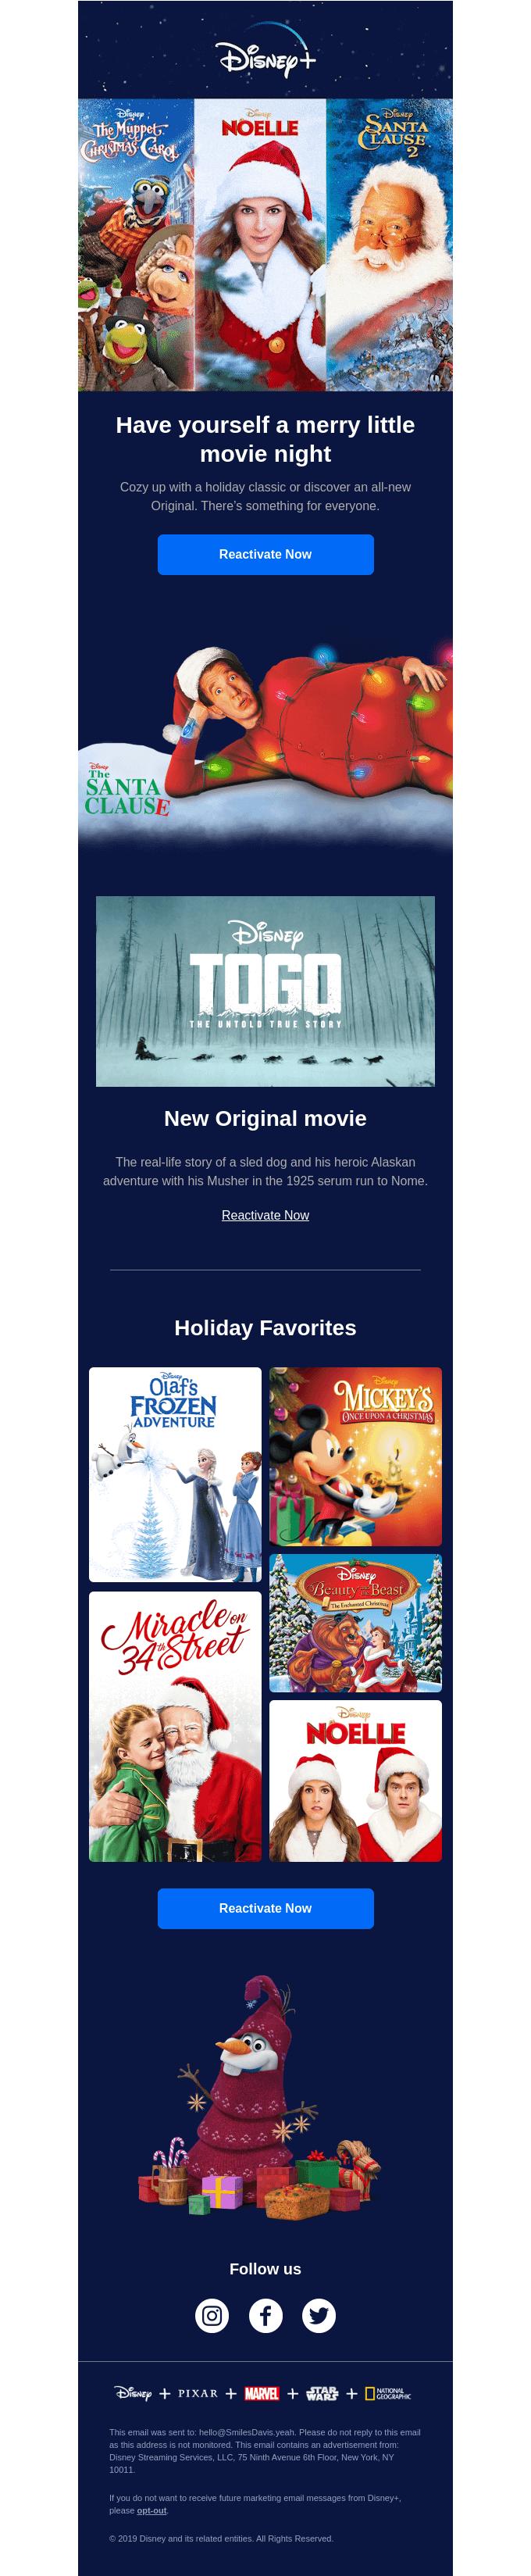 Celebration Scarcity: Disney+ Reactivation Holiday Email